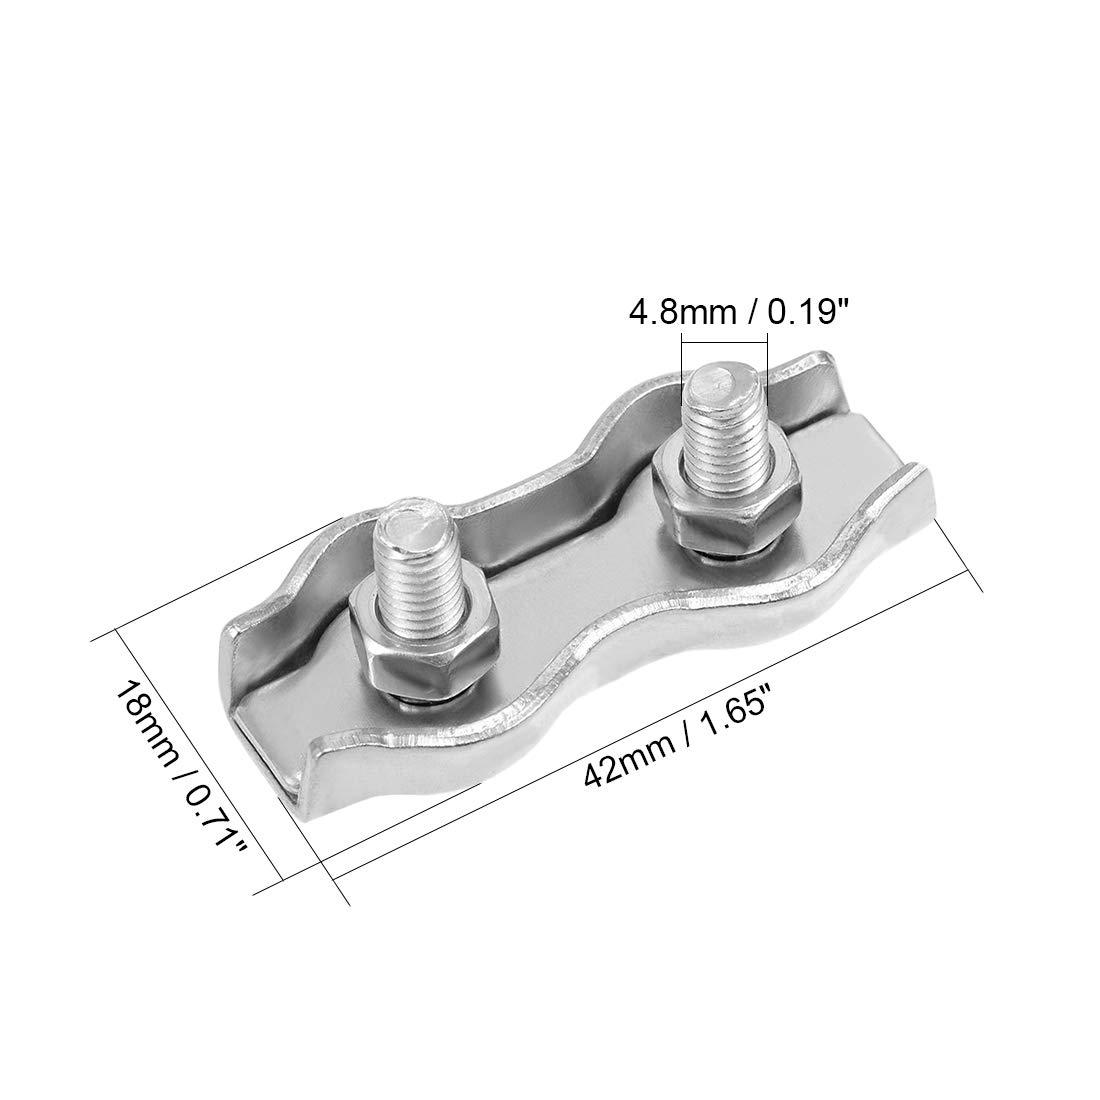 sourcing map Juego de Abrazadera broche perro sujetador de cable de acero inoxidable de tensi/ón d/úplex de doble cara sujetadores con doble tornillo para cable de acero de 2mm-3mm 4 piezas